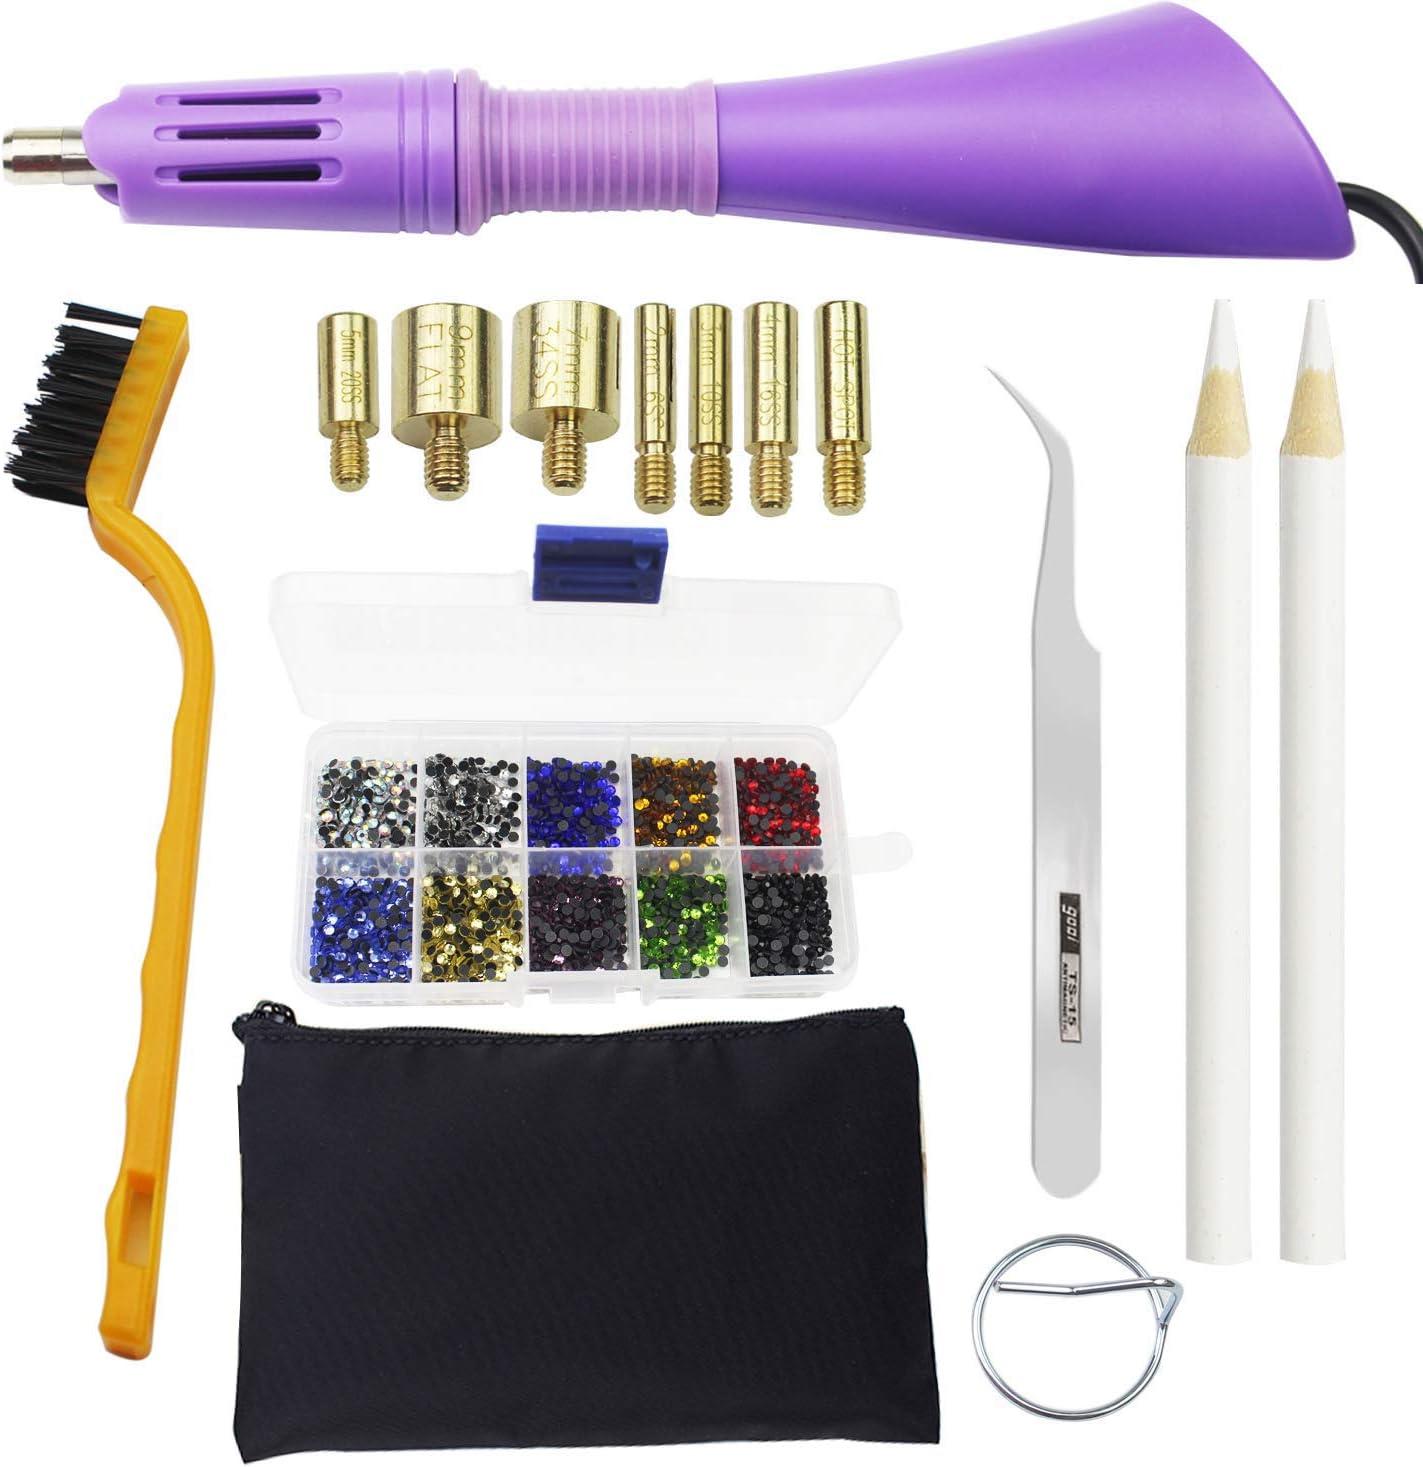 Hotfix Applicator Wand Tool with 7 tips and Kit DIY  2000pcs Rhinestones Crystal